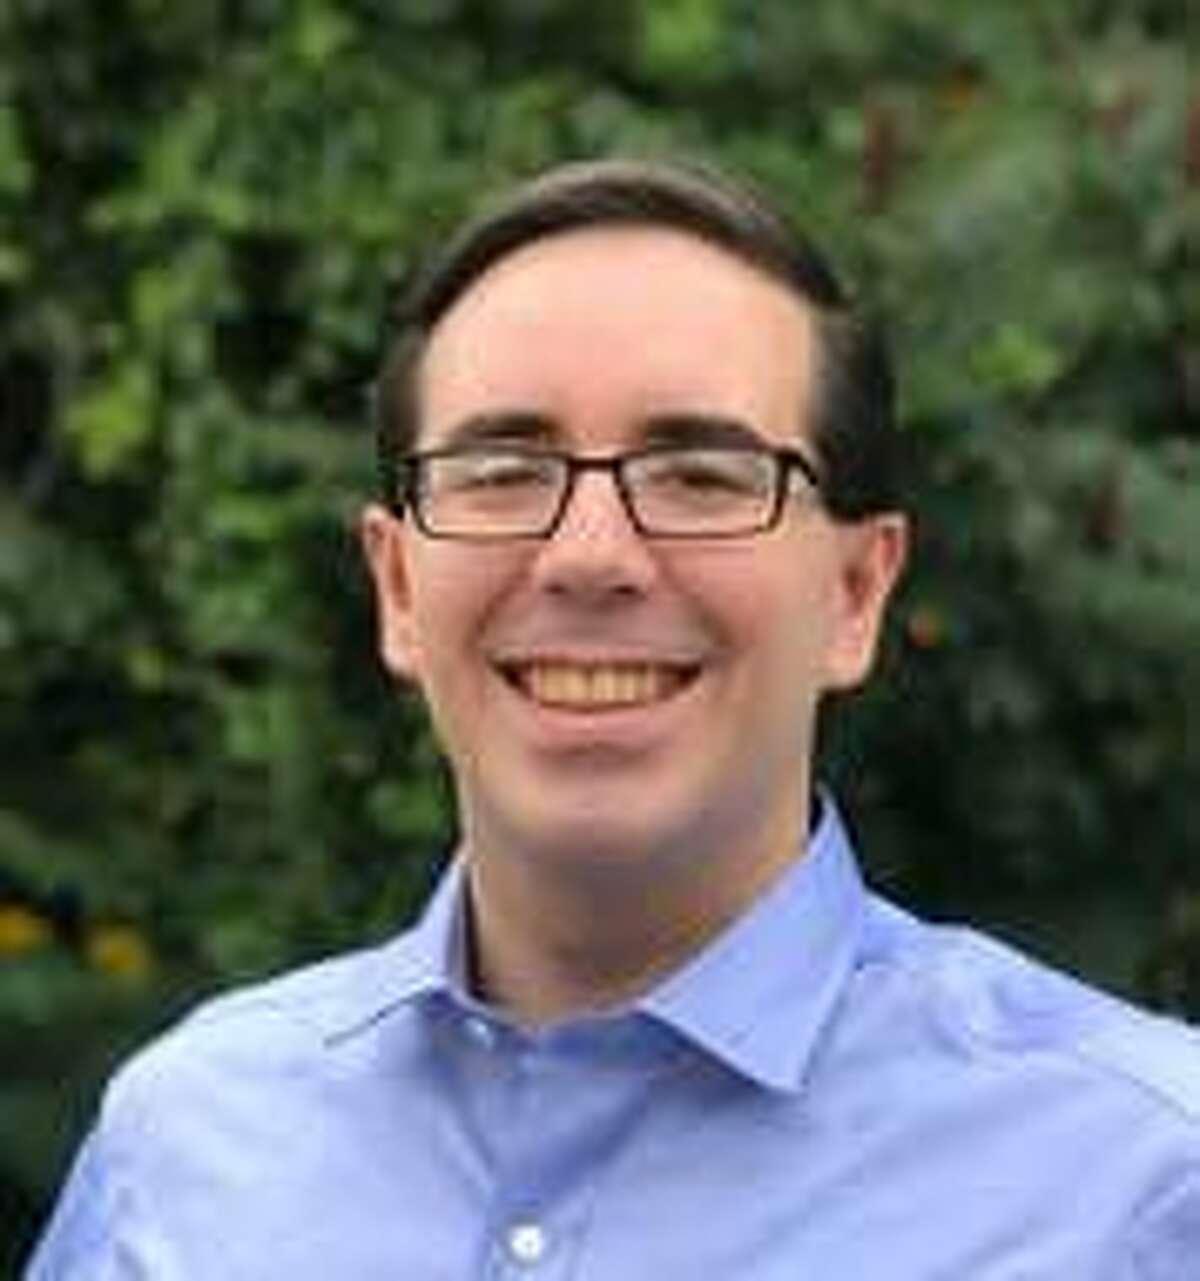 Incumbent Democrat Edward Corey won in the Democratic primary for the Torrington Board of Education.